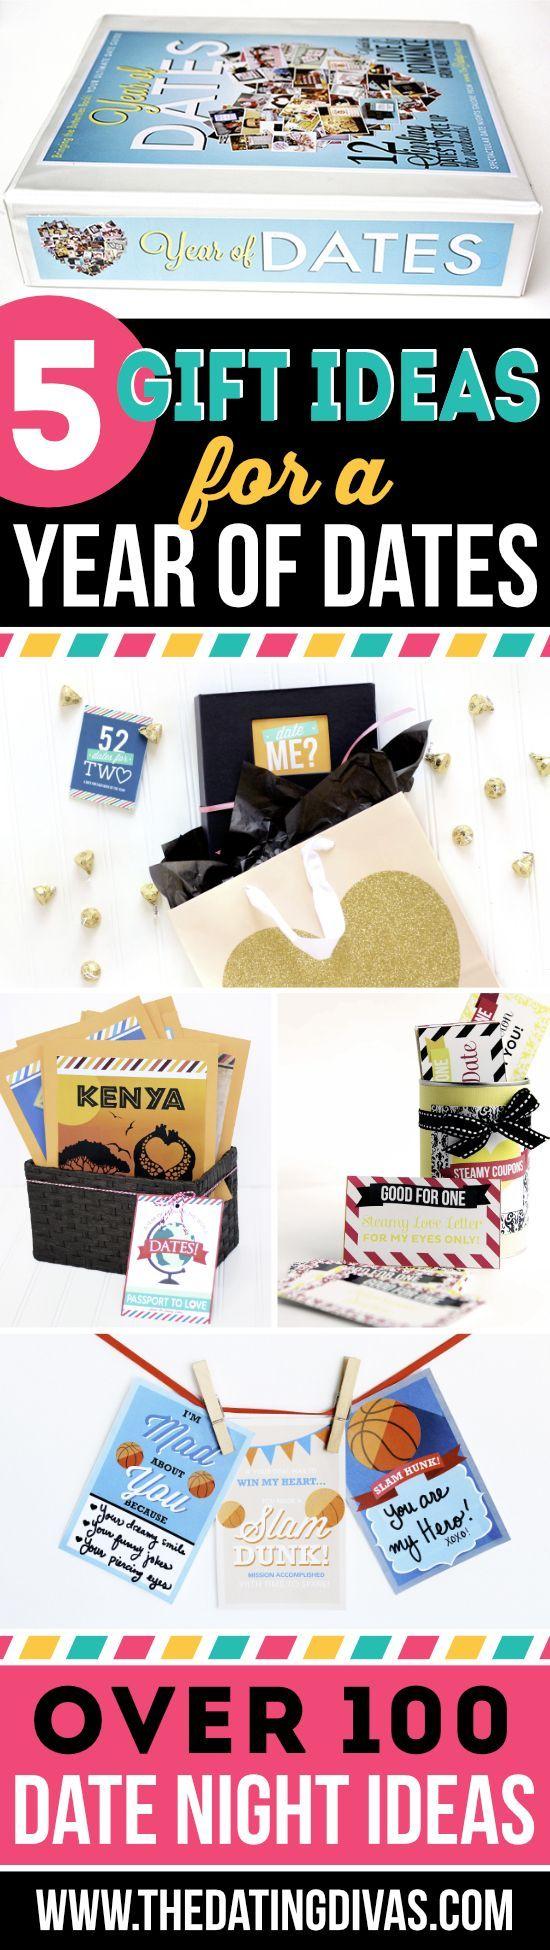 Date night gift ideas christmas